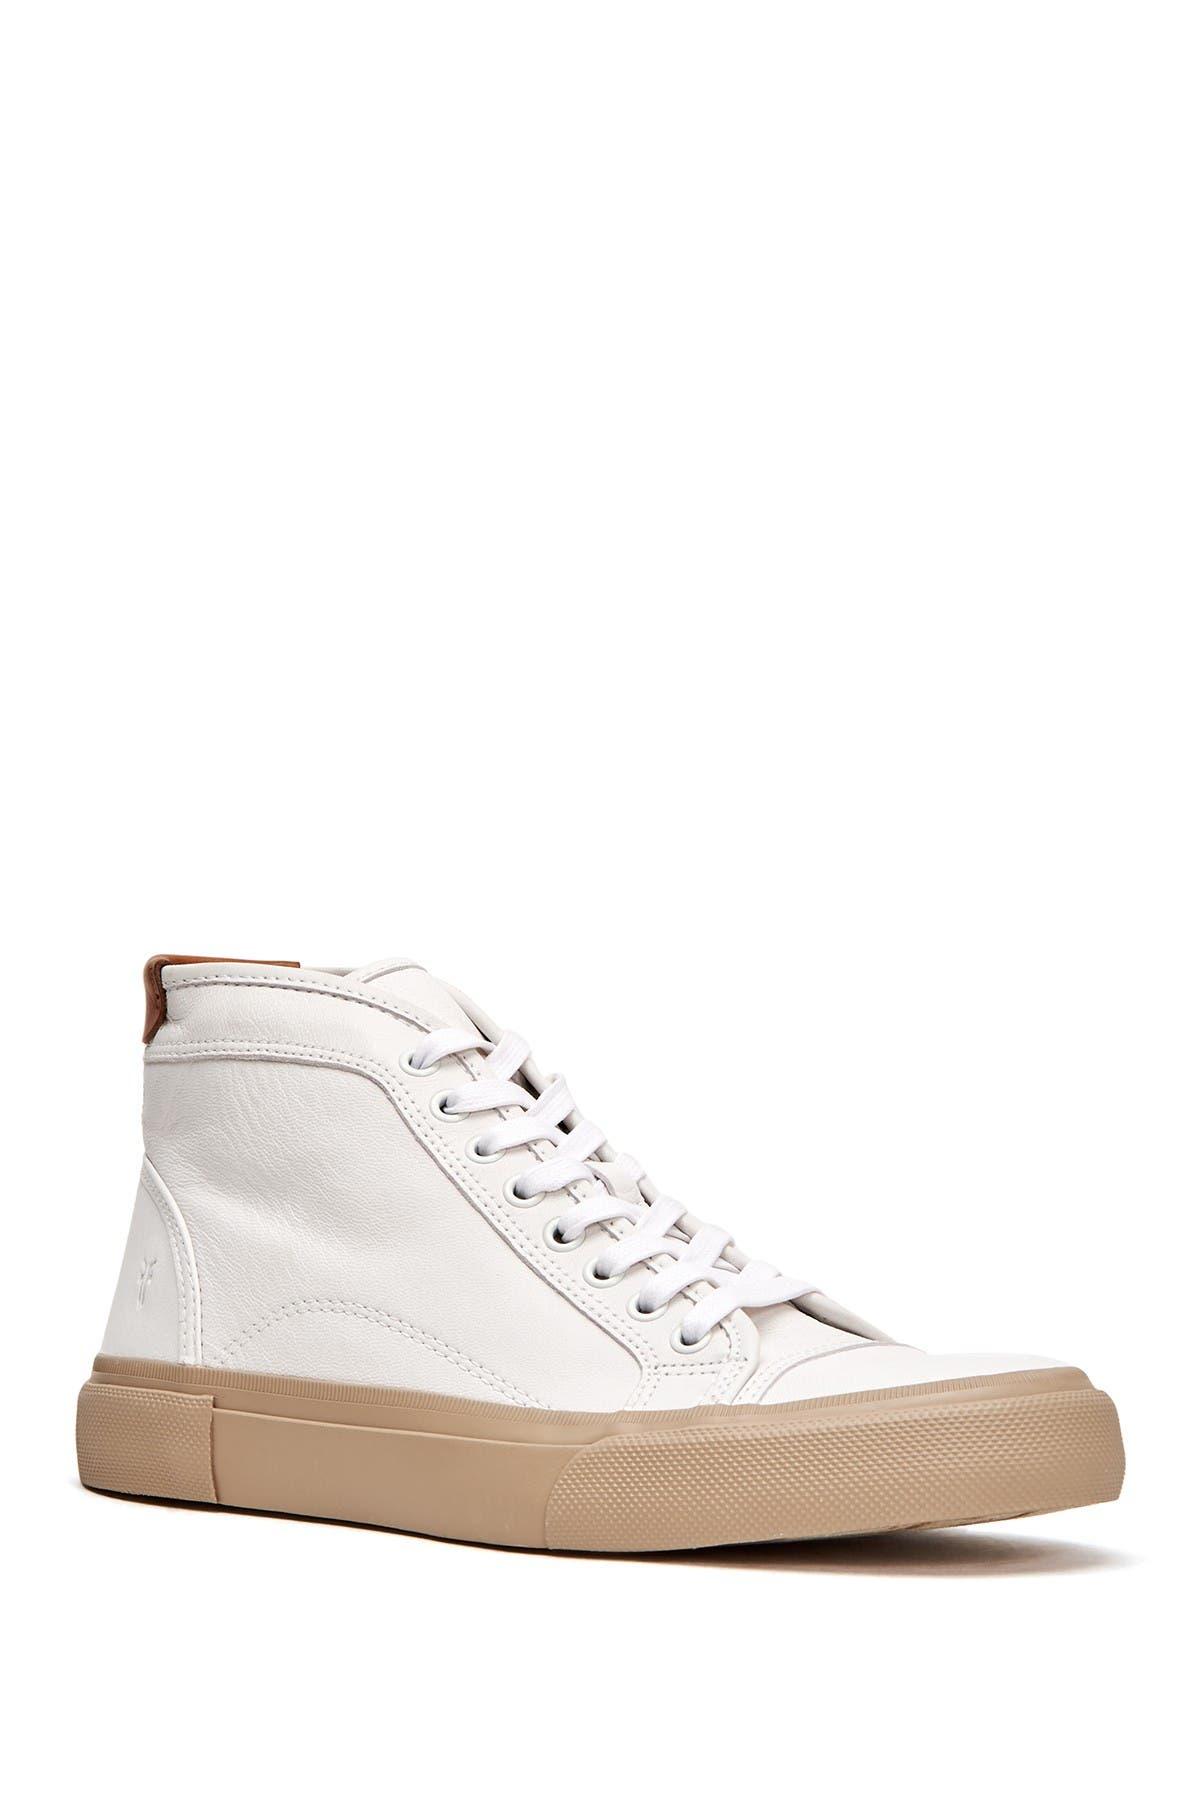 Frye | Ludlow Cap Toe High Top Sneaker